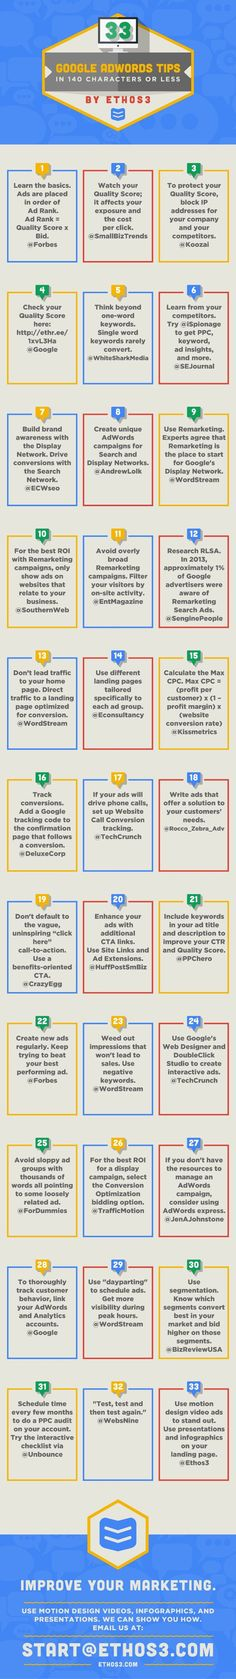 33 Google Adwords tips #infographic